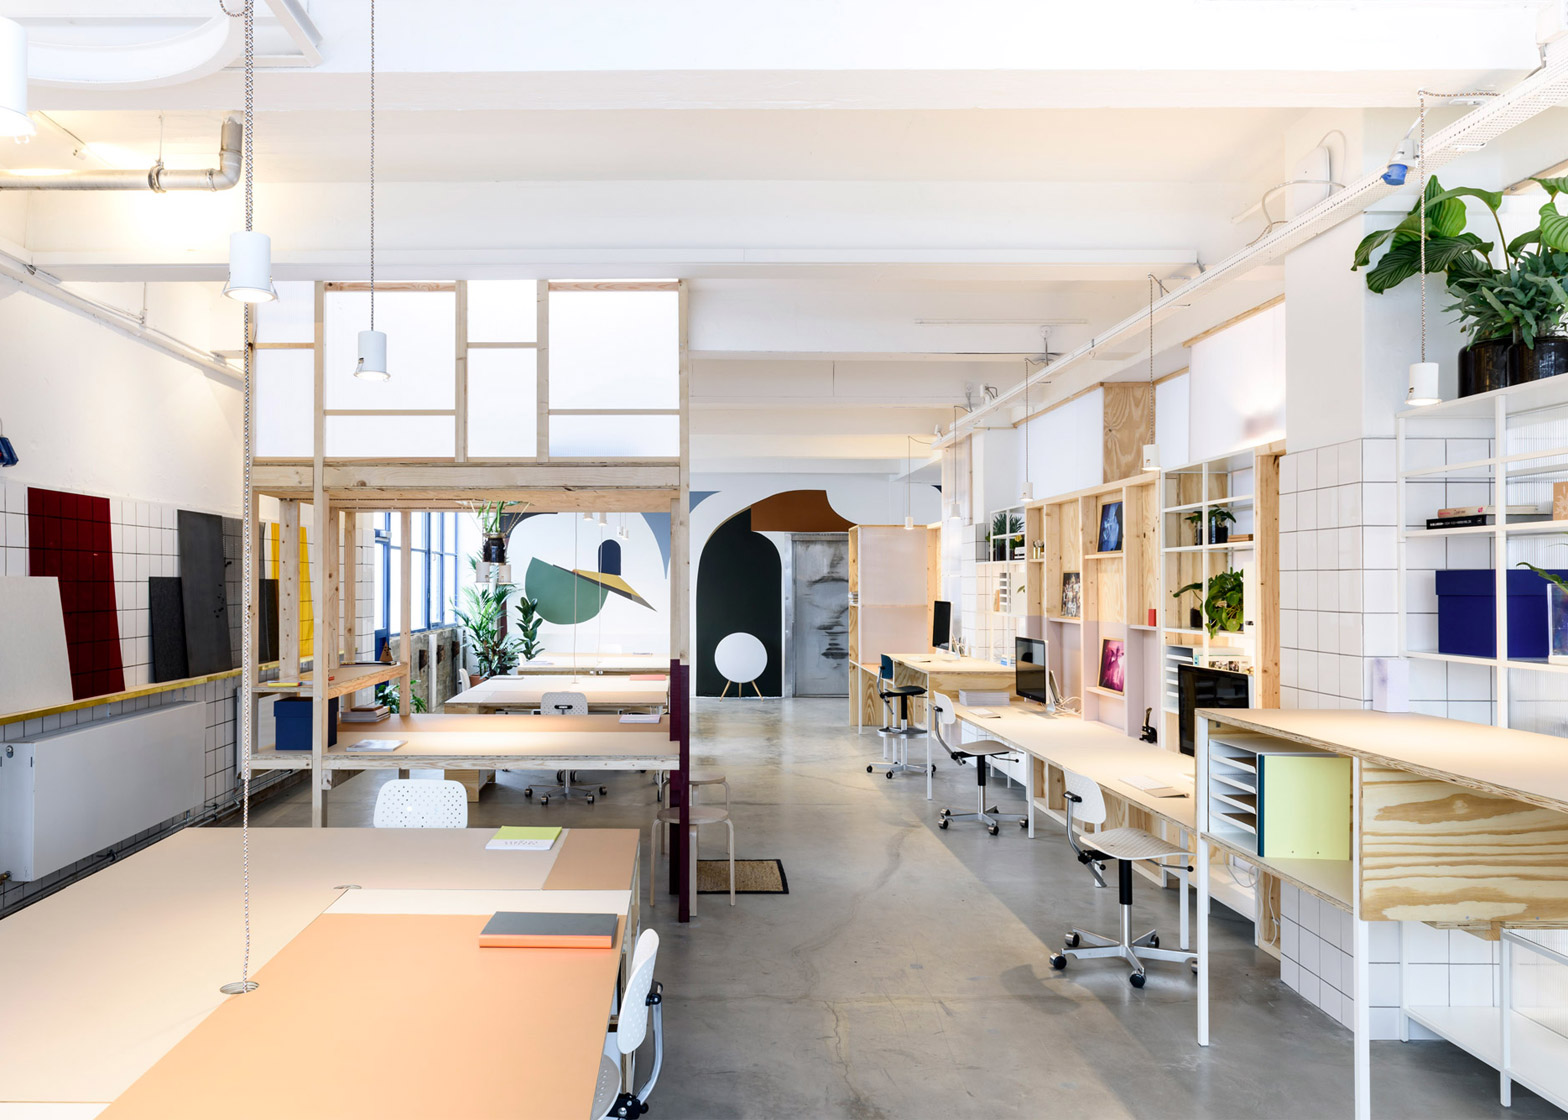 Ikea-Space-10-Innovation-Lab_Alastair-Philip-Wiper_dezeen_1568_10